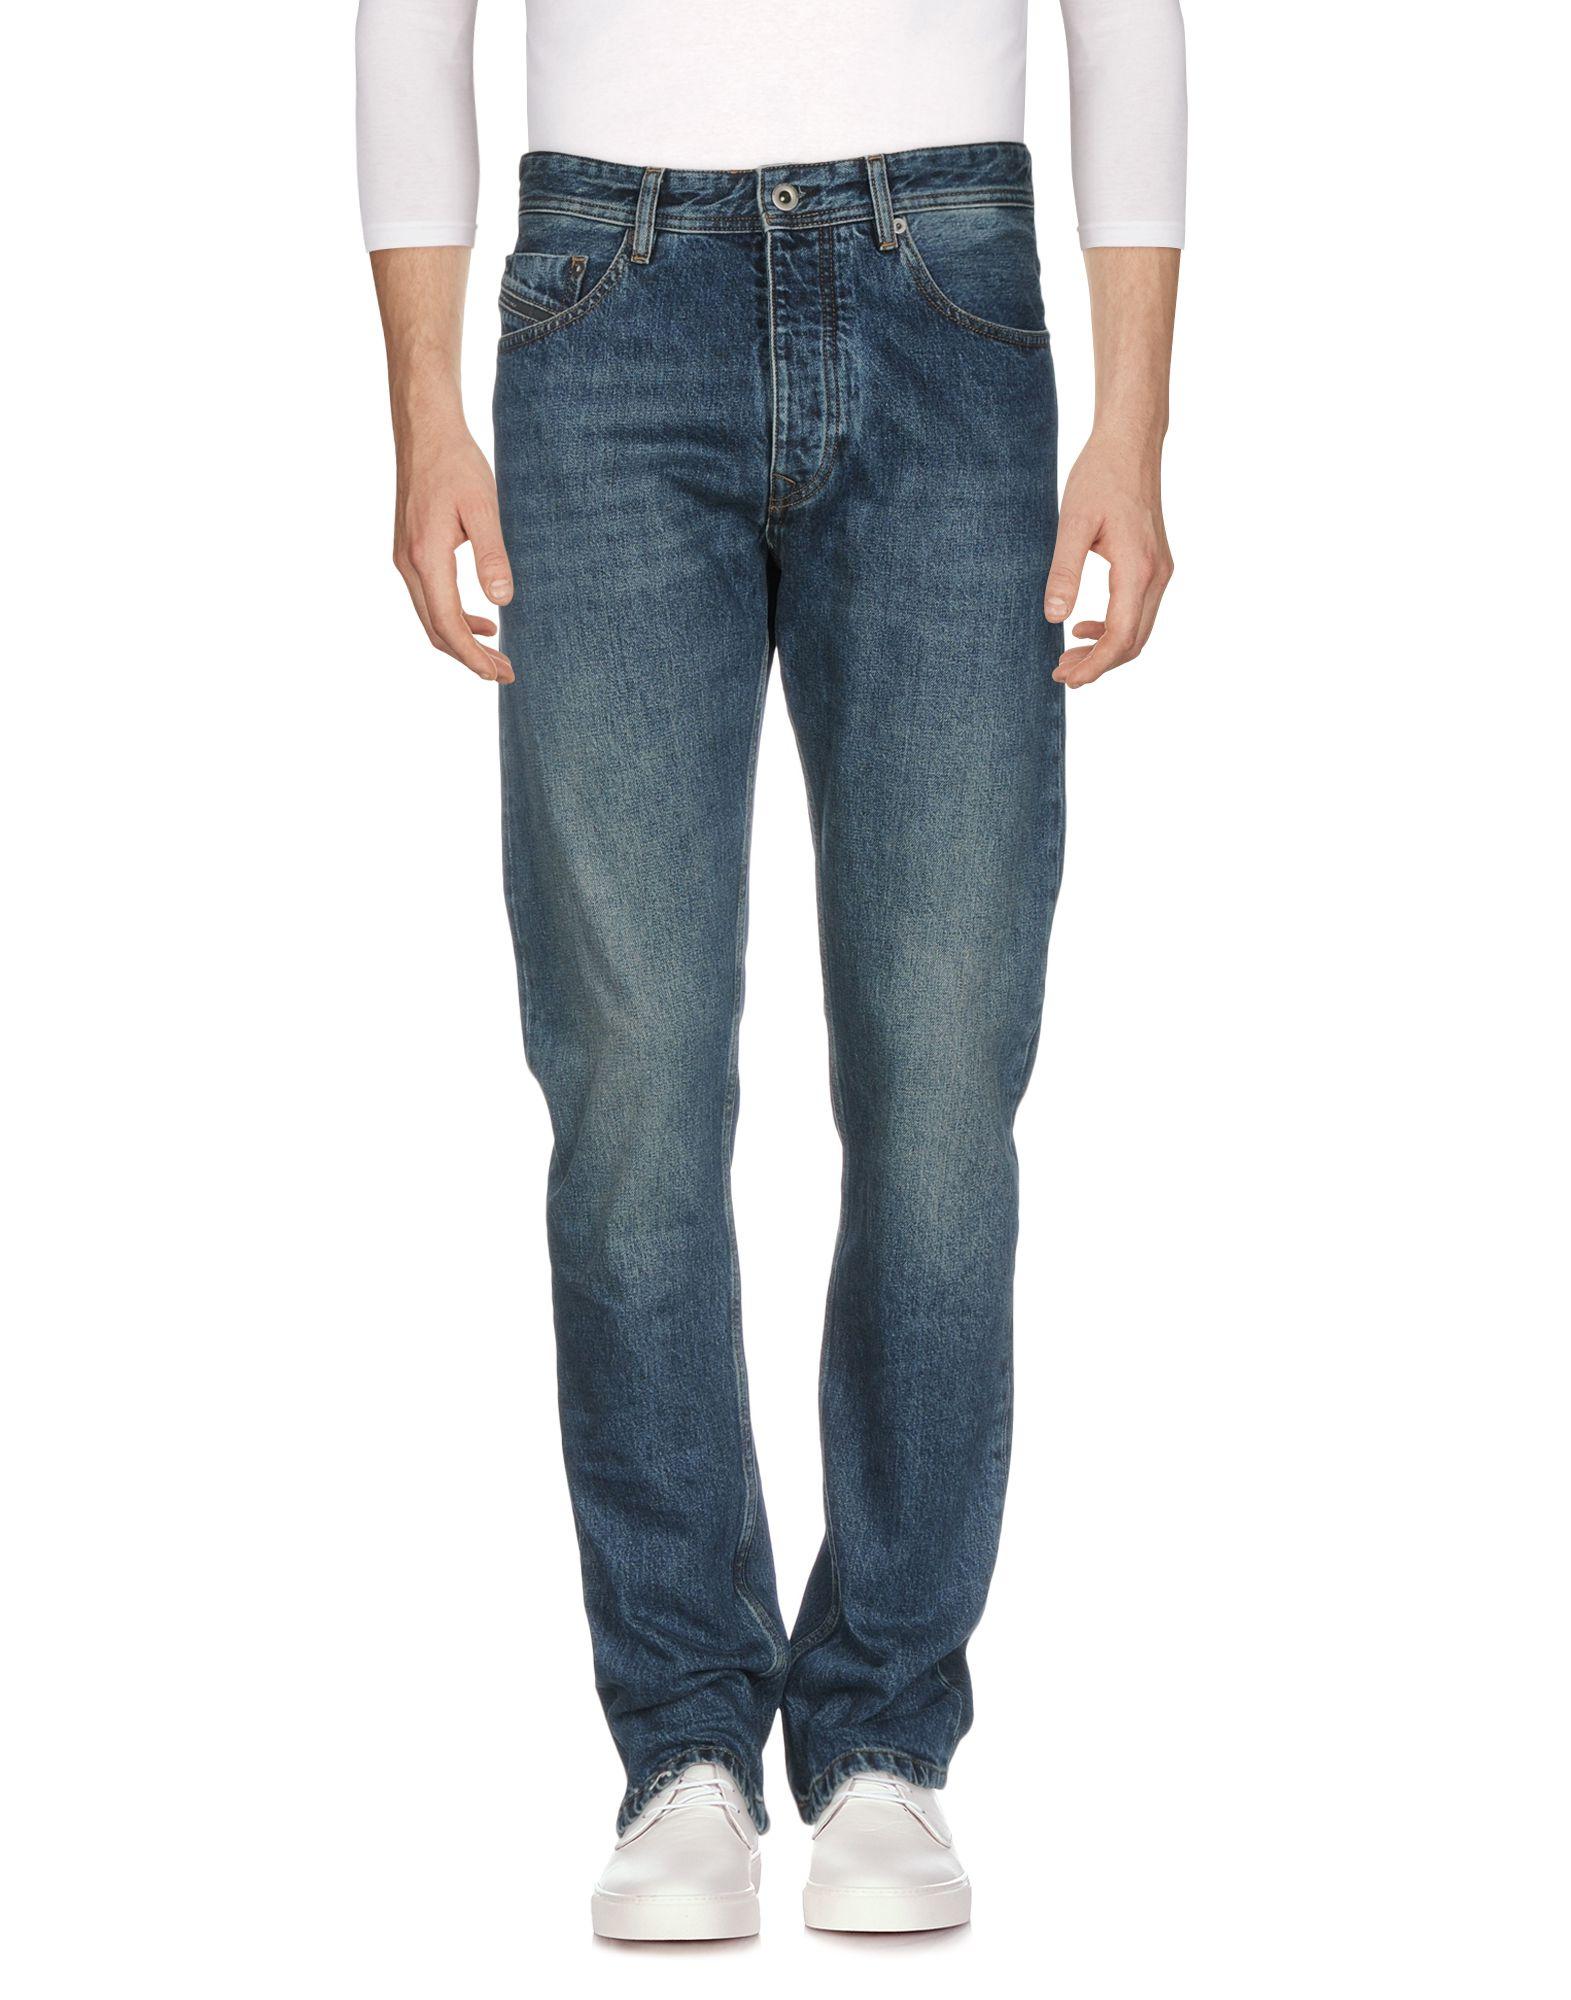 Pantaloni Jeans Diesel Black Gold Uomo - Acquista online su